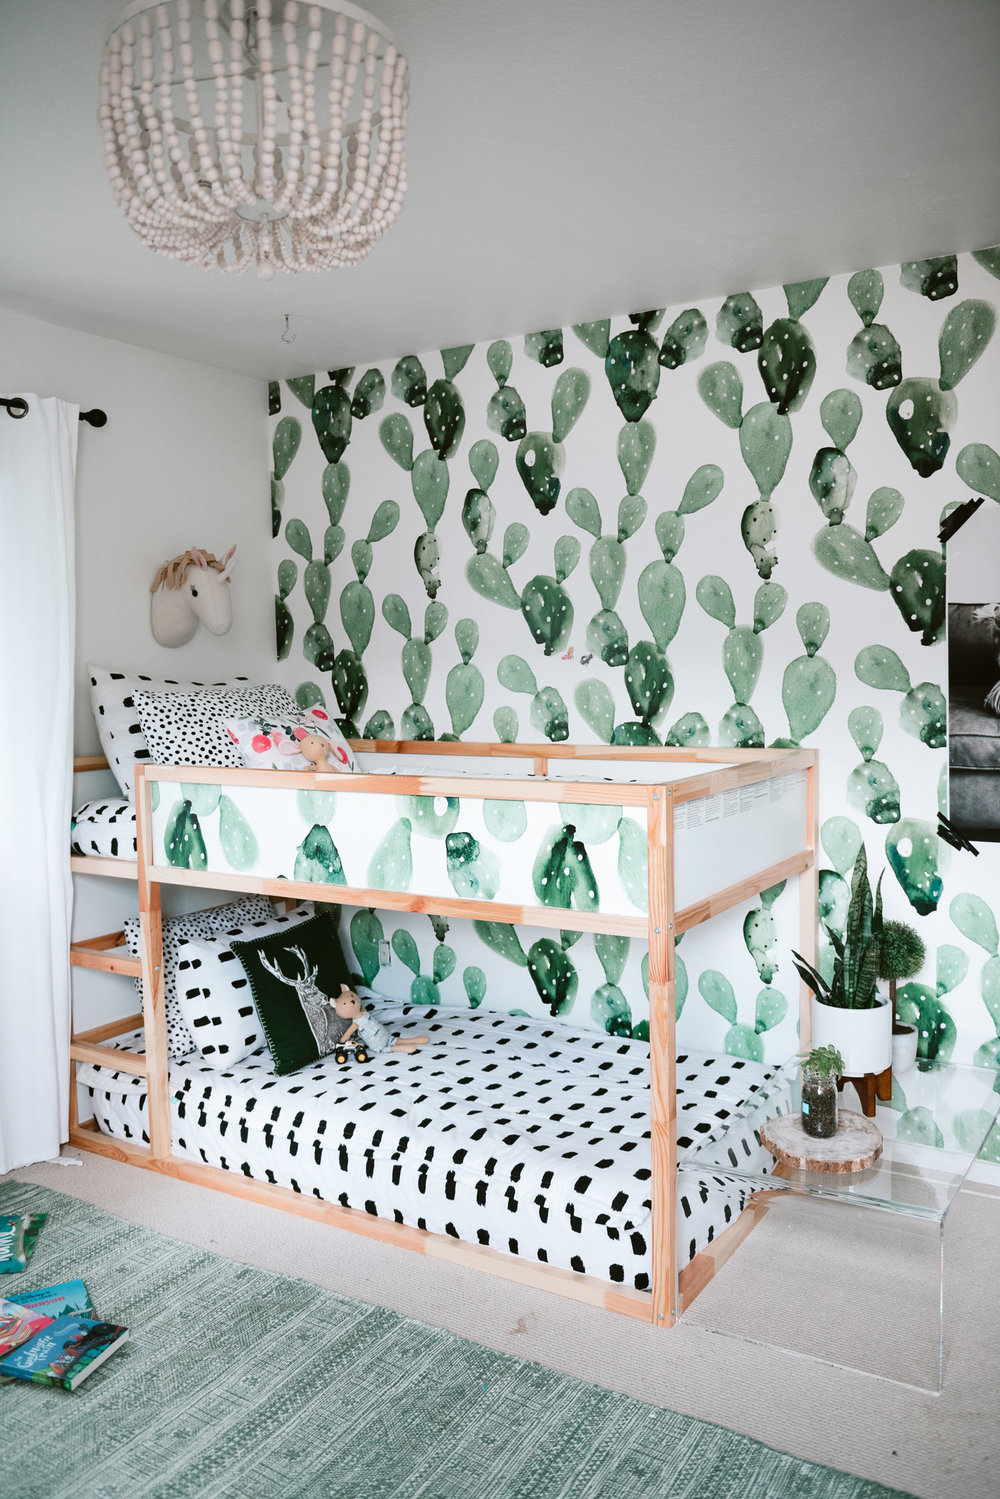 west-elm-family-friendly-decorating-023.jpg